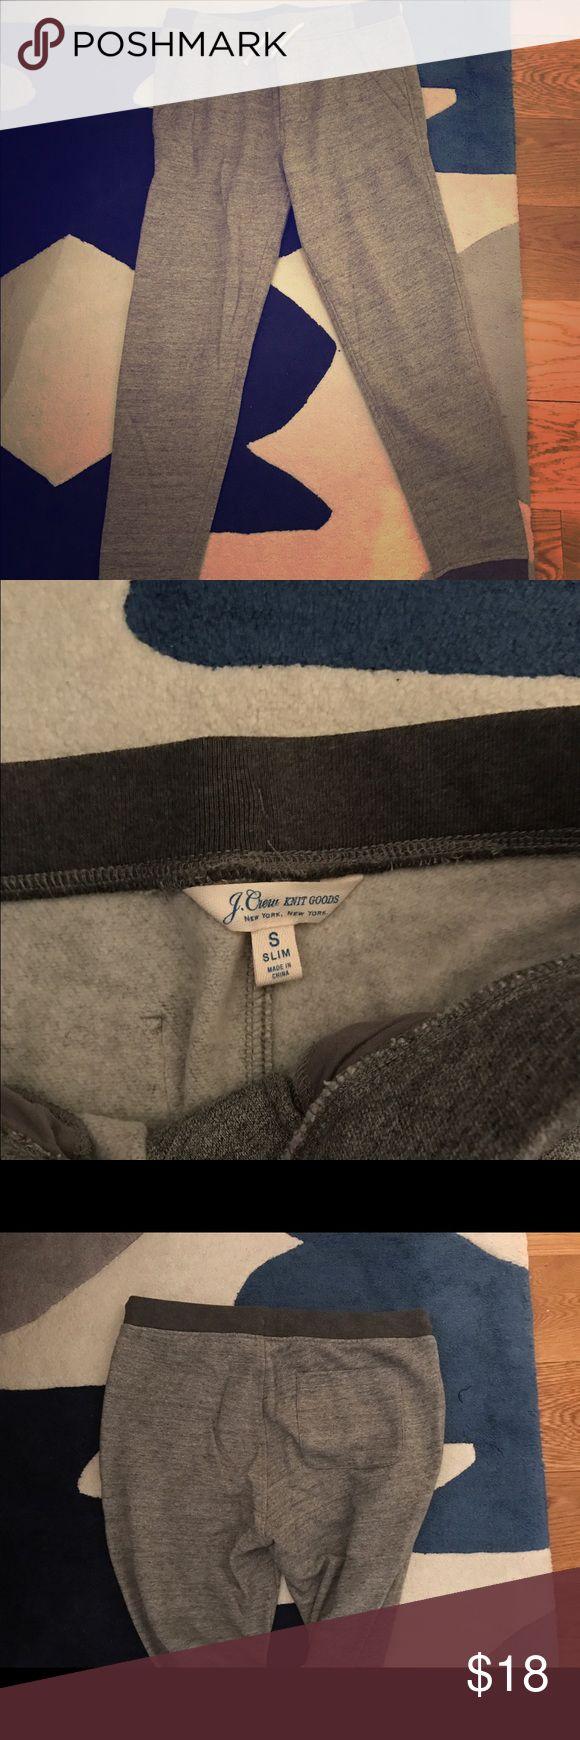 Men's Jcrew Slim Fit Jogger Sweatpants Men's J.Crew Slim Fit Jogger sweatpants size small. 1 pack pocket, cuffed bottom. J. Crew Pants Sweatpants & Joggers